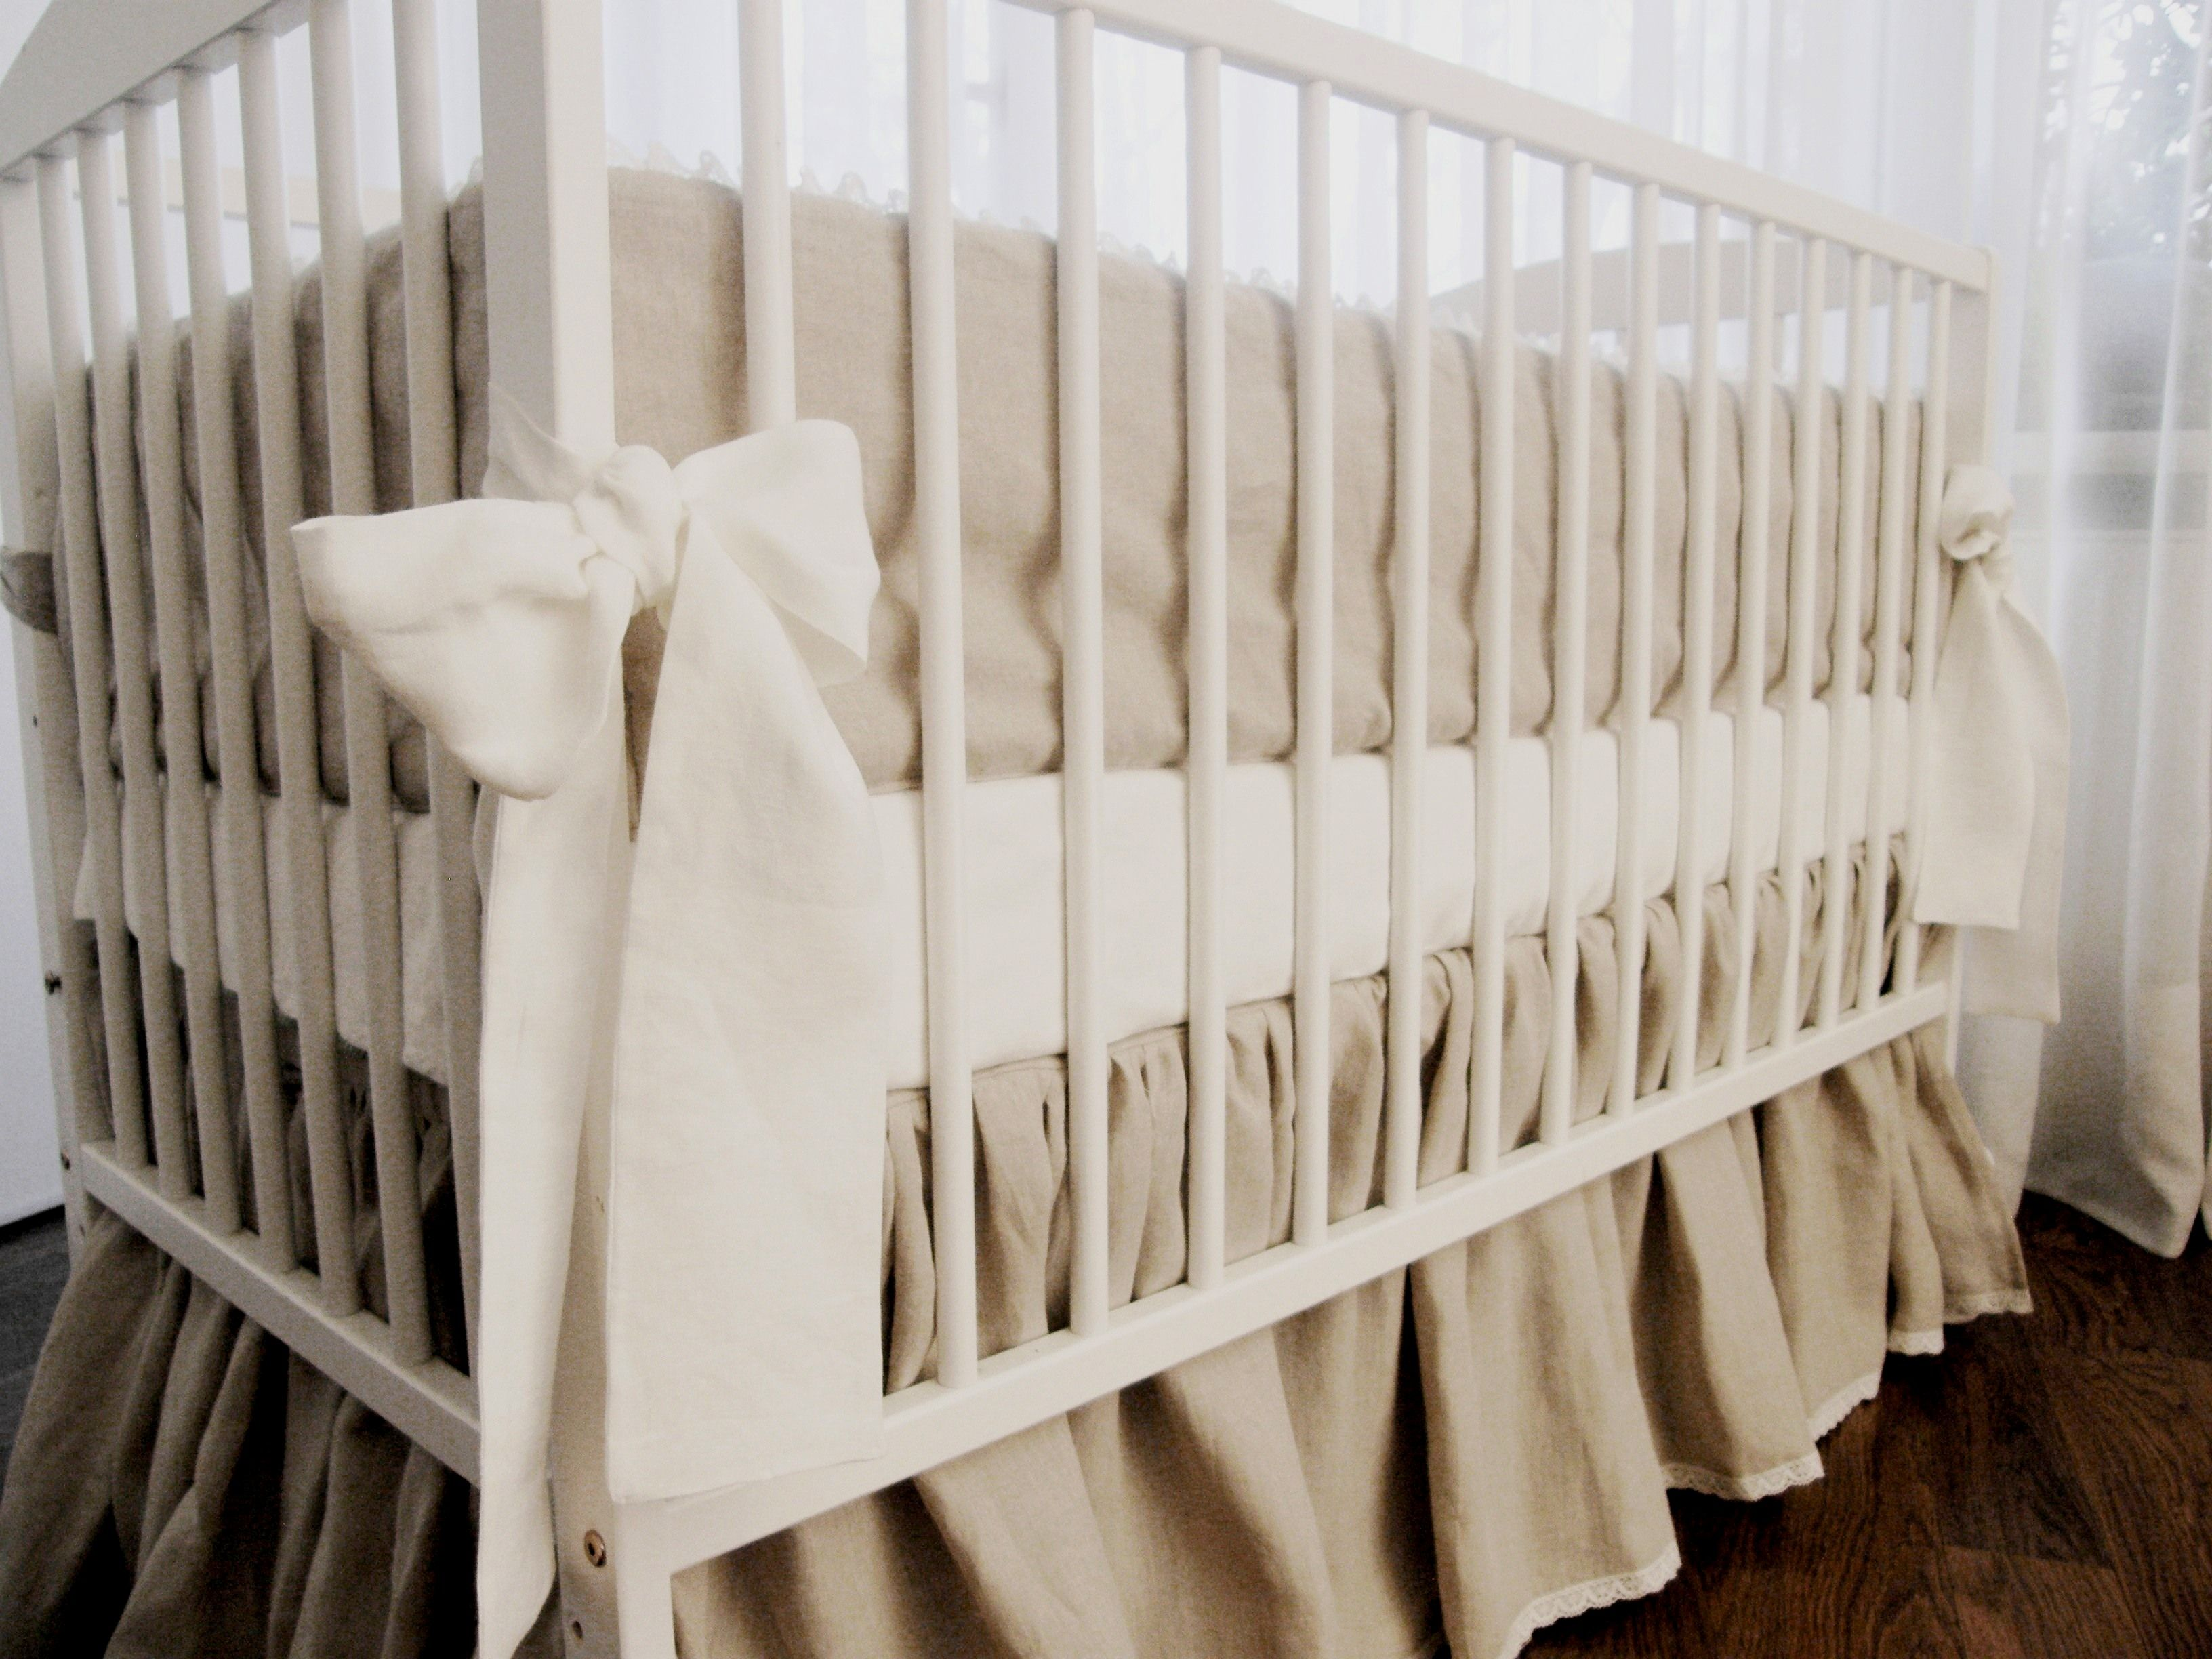 yellow nursery and sets room bedroom grey boy sheets cot linens shark skirt linen neutral themes gender baby bedding green crib monkey cribs